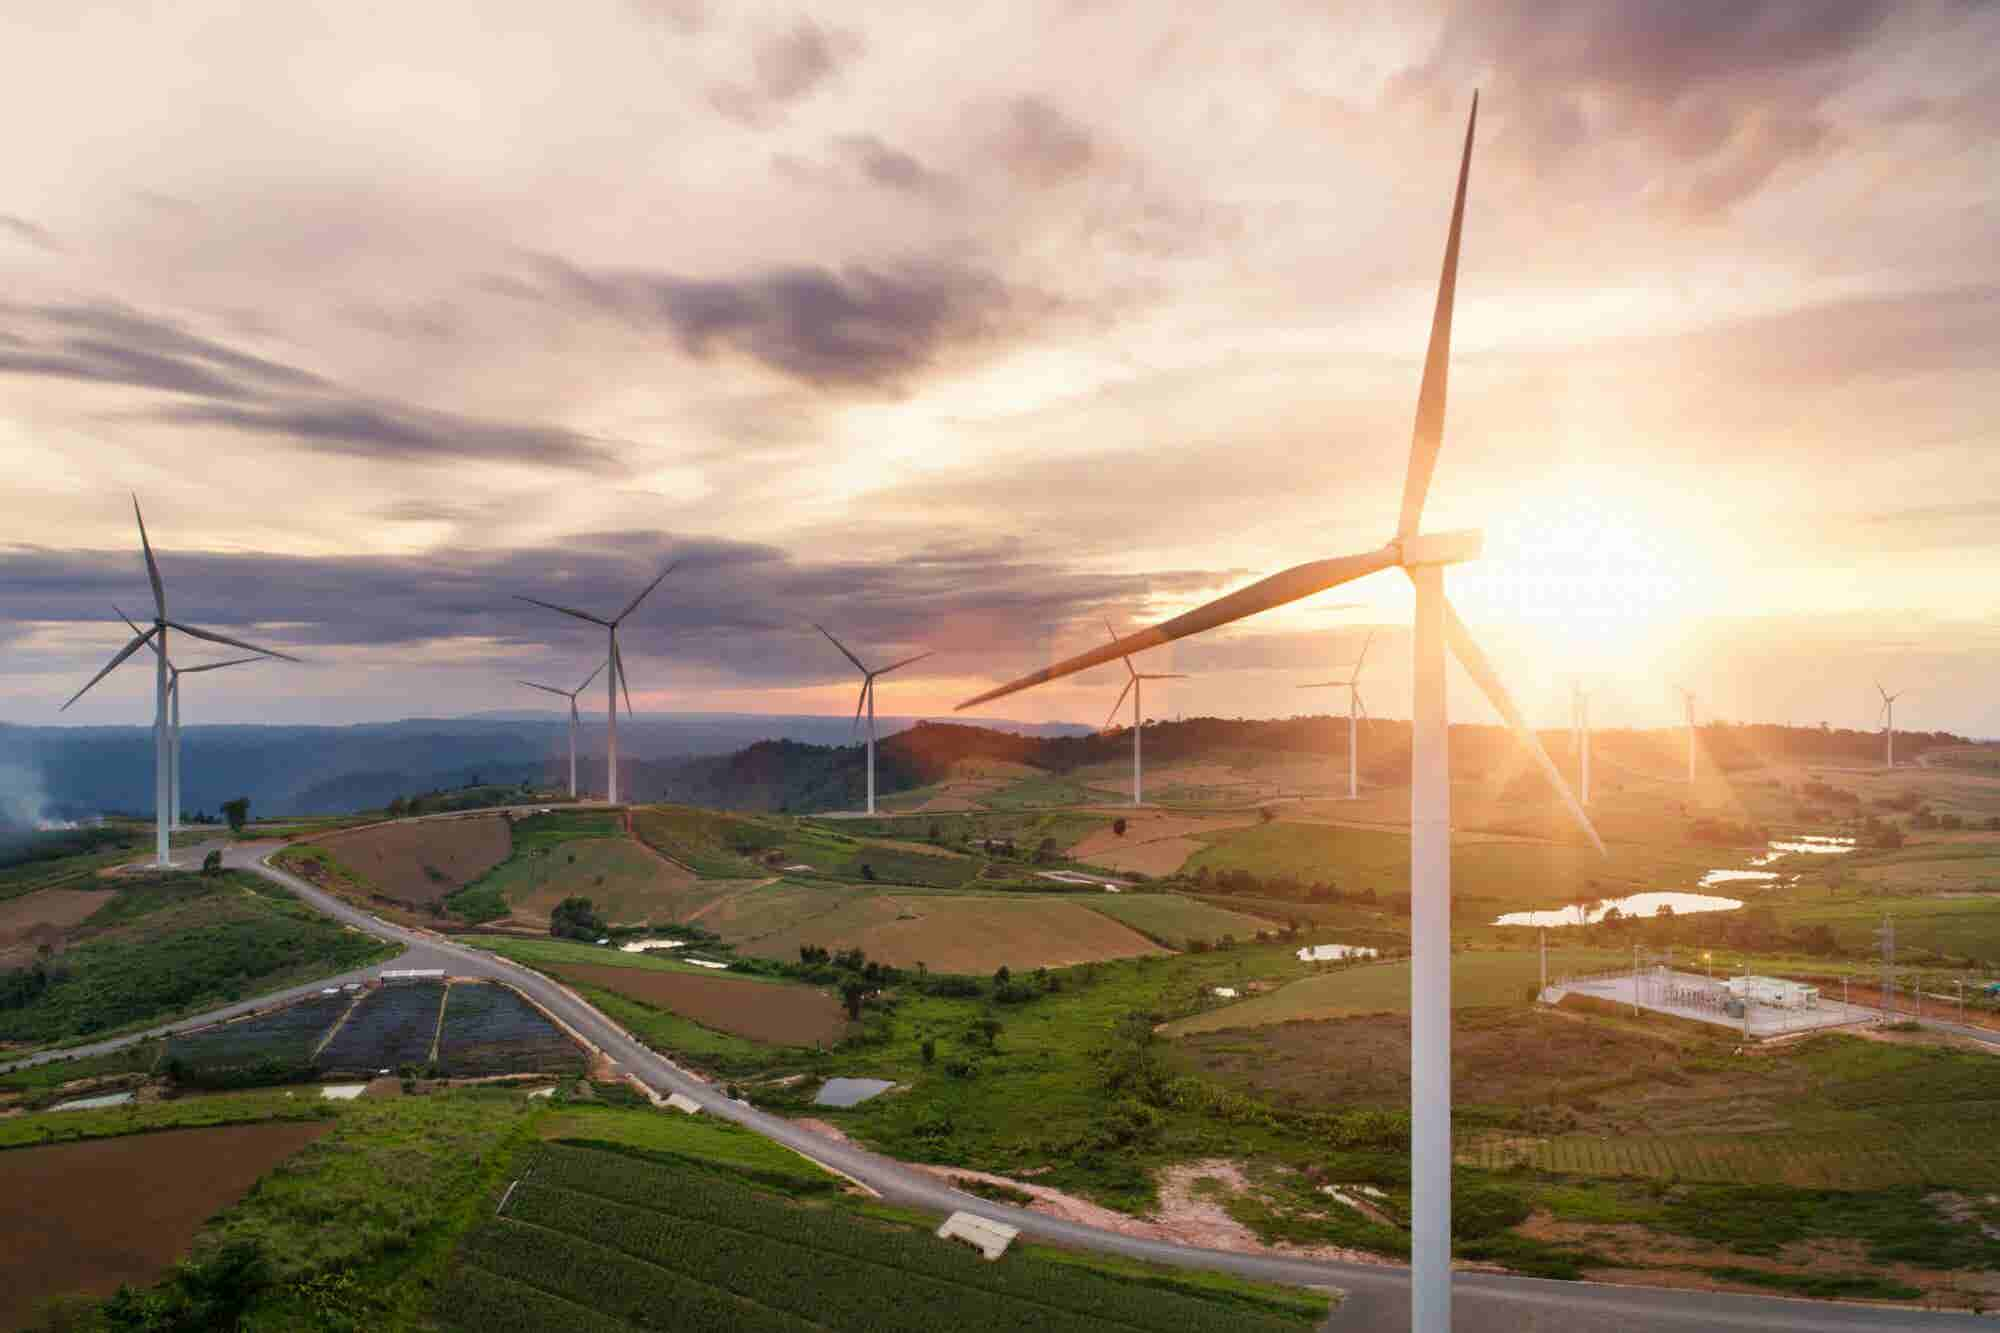 The Surprising Advantages Environmental Entrepreneurs Have Over Established Companies